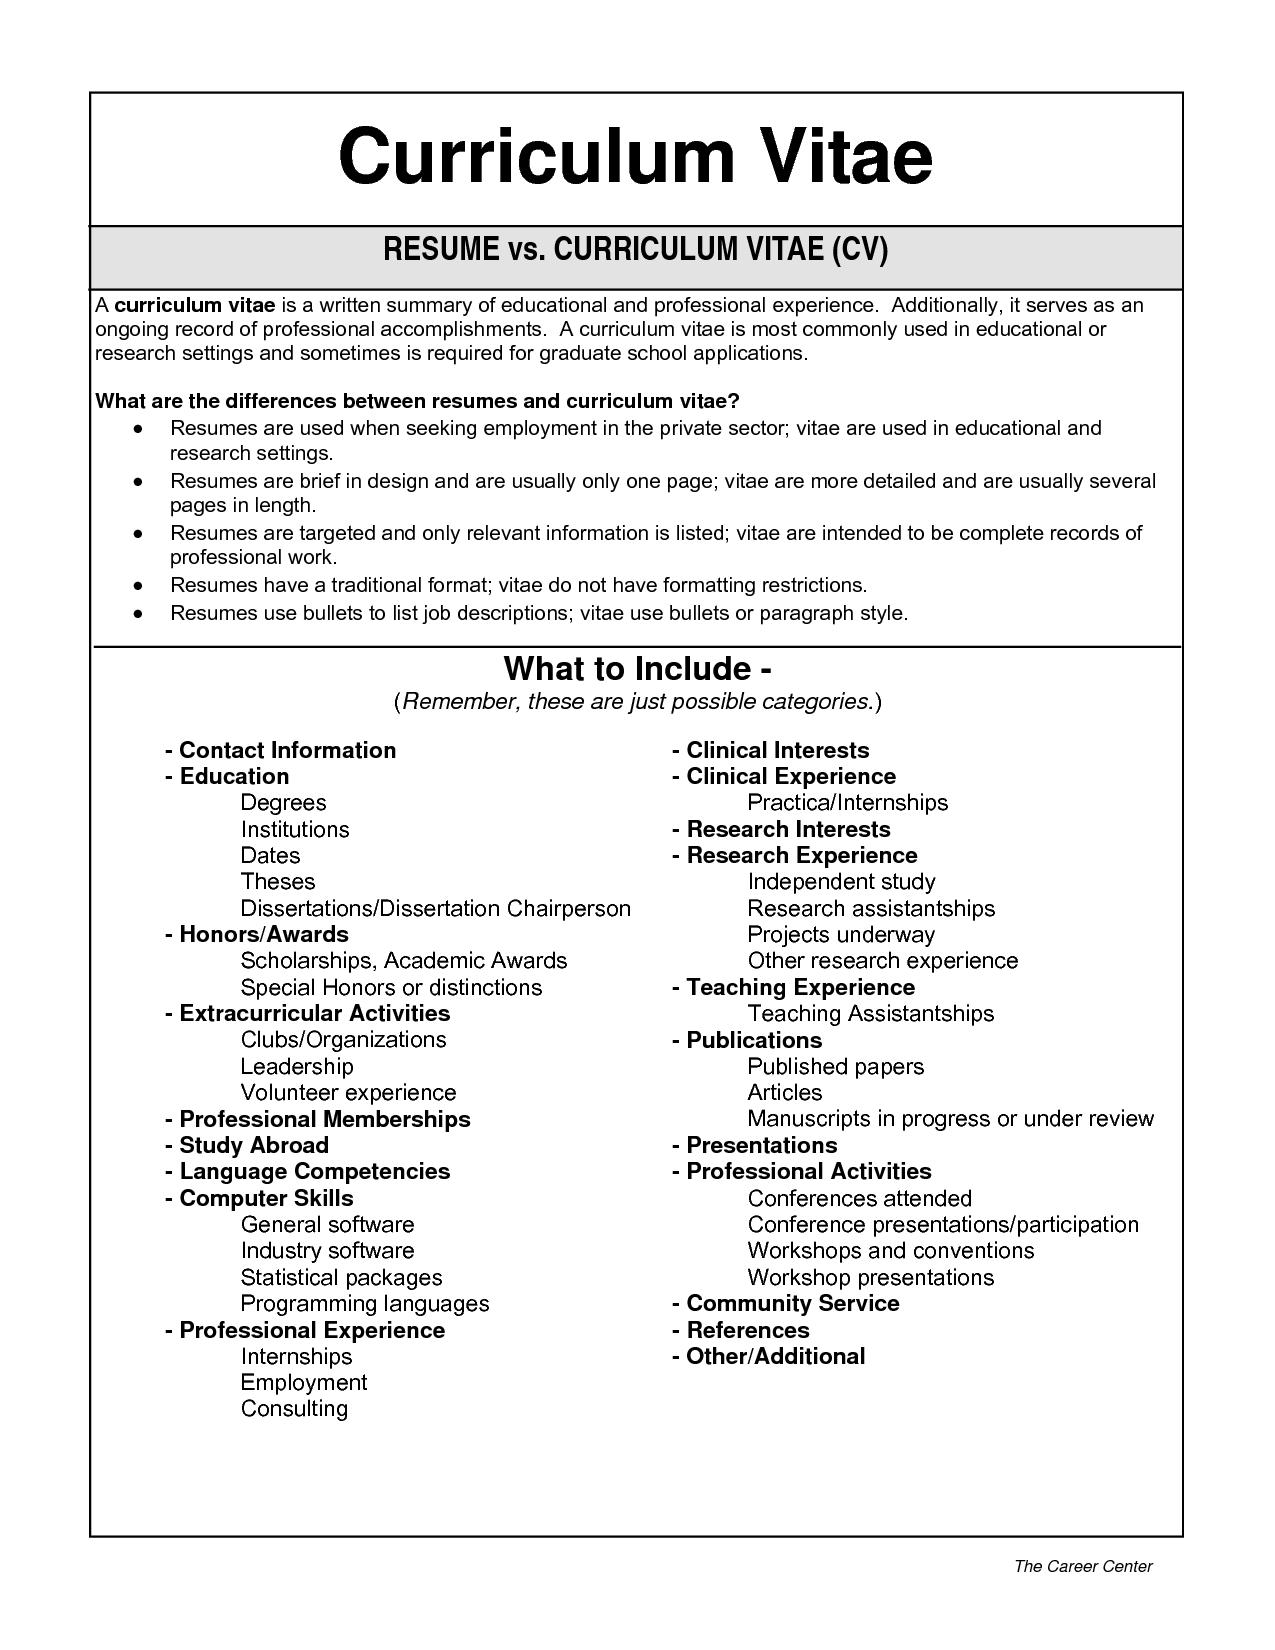 What Is A Curriculum Vitae How To Write A Cv Resume Template Builderhow To Write A Resume Job